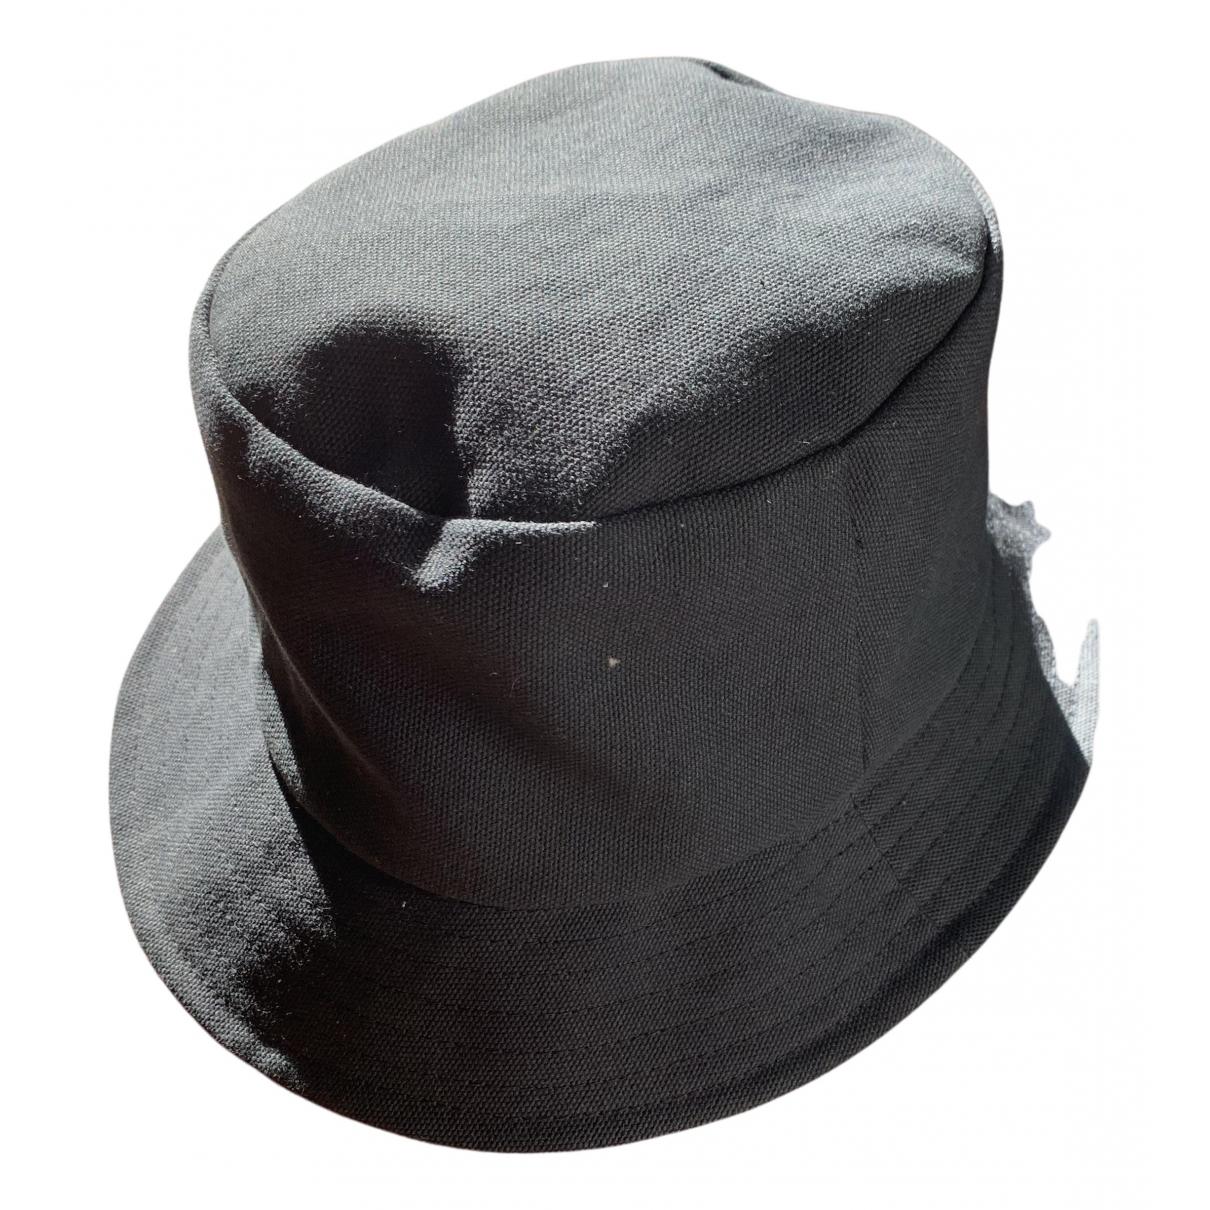 Apc N Navy Cotton hat for Women 54 cm